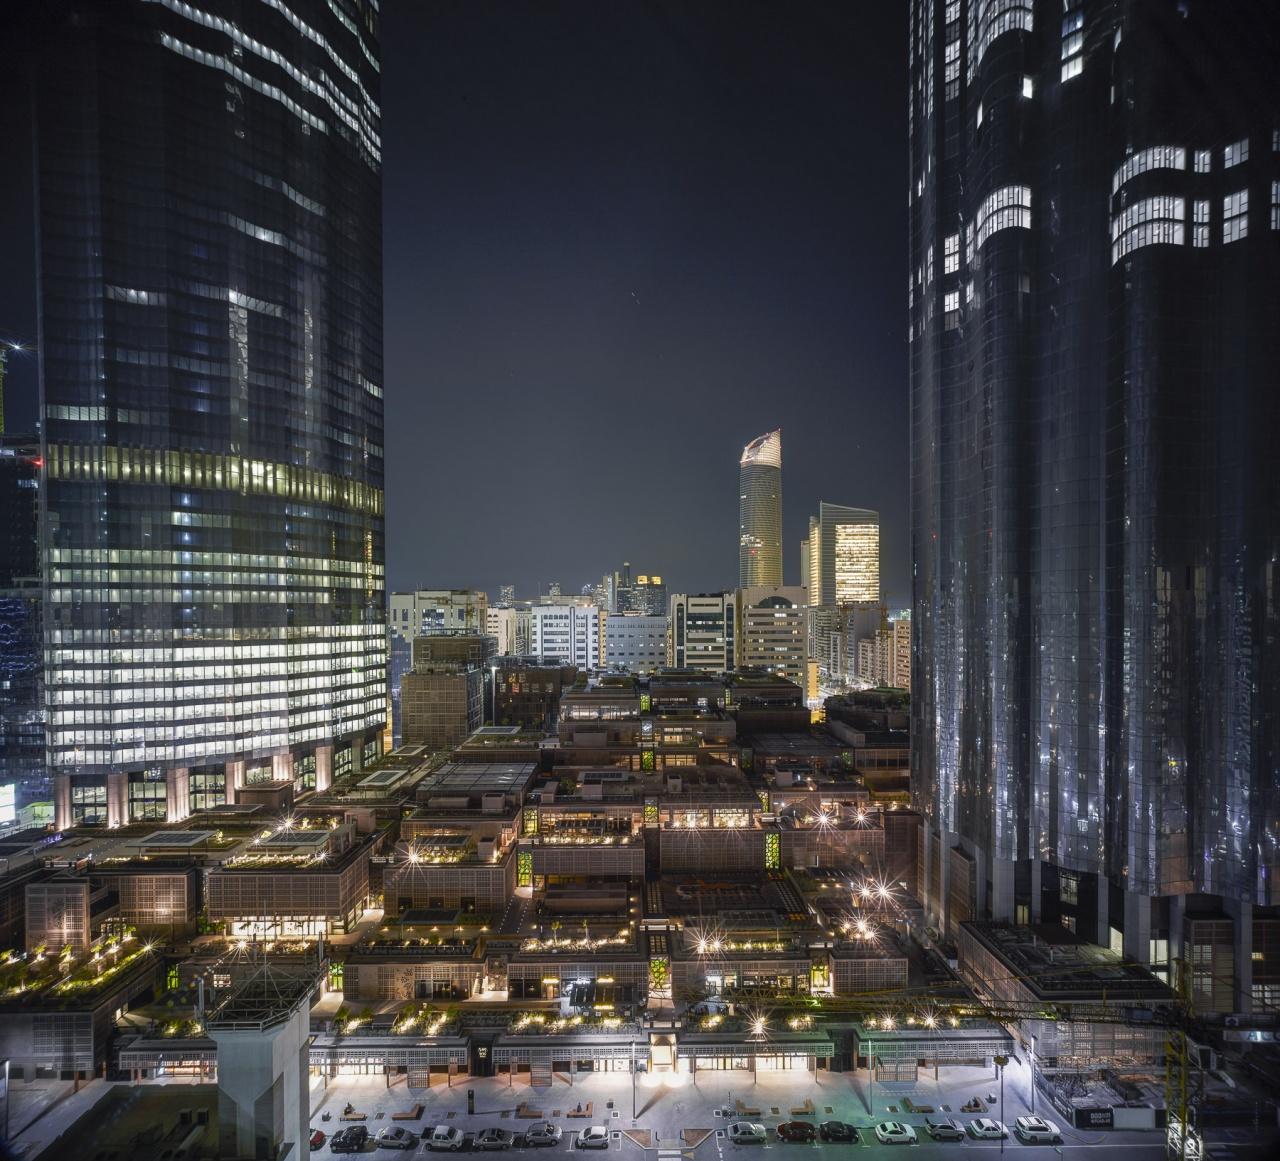 Abu Dhabi - Central Market